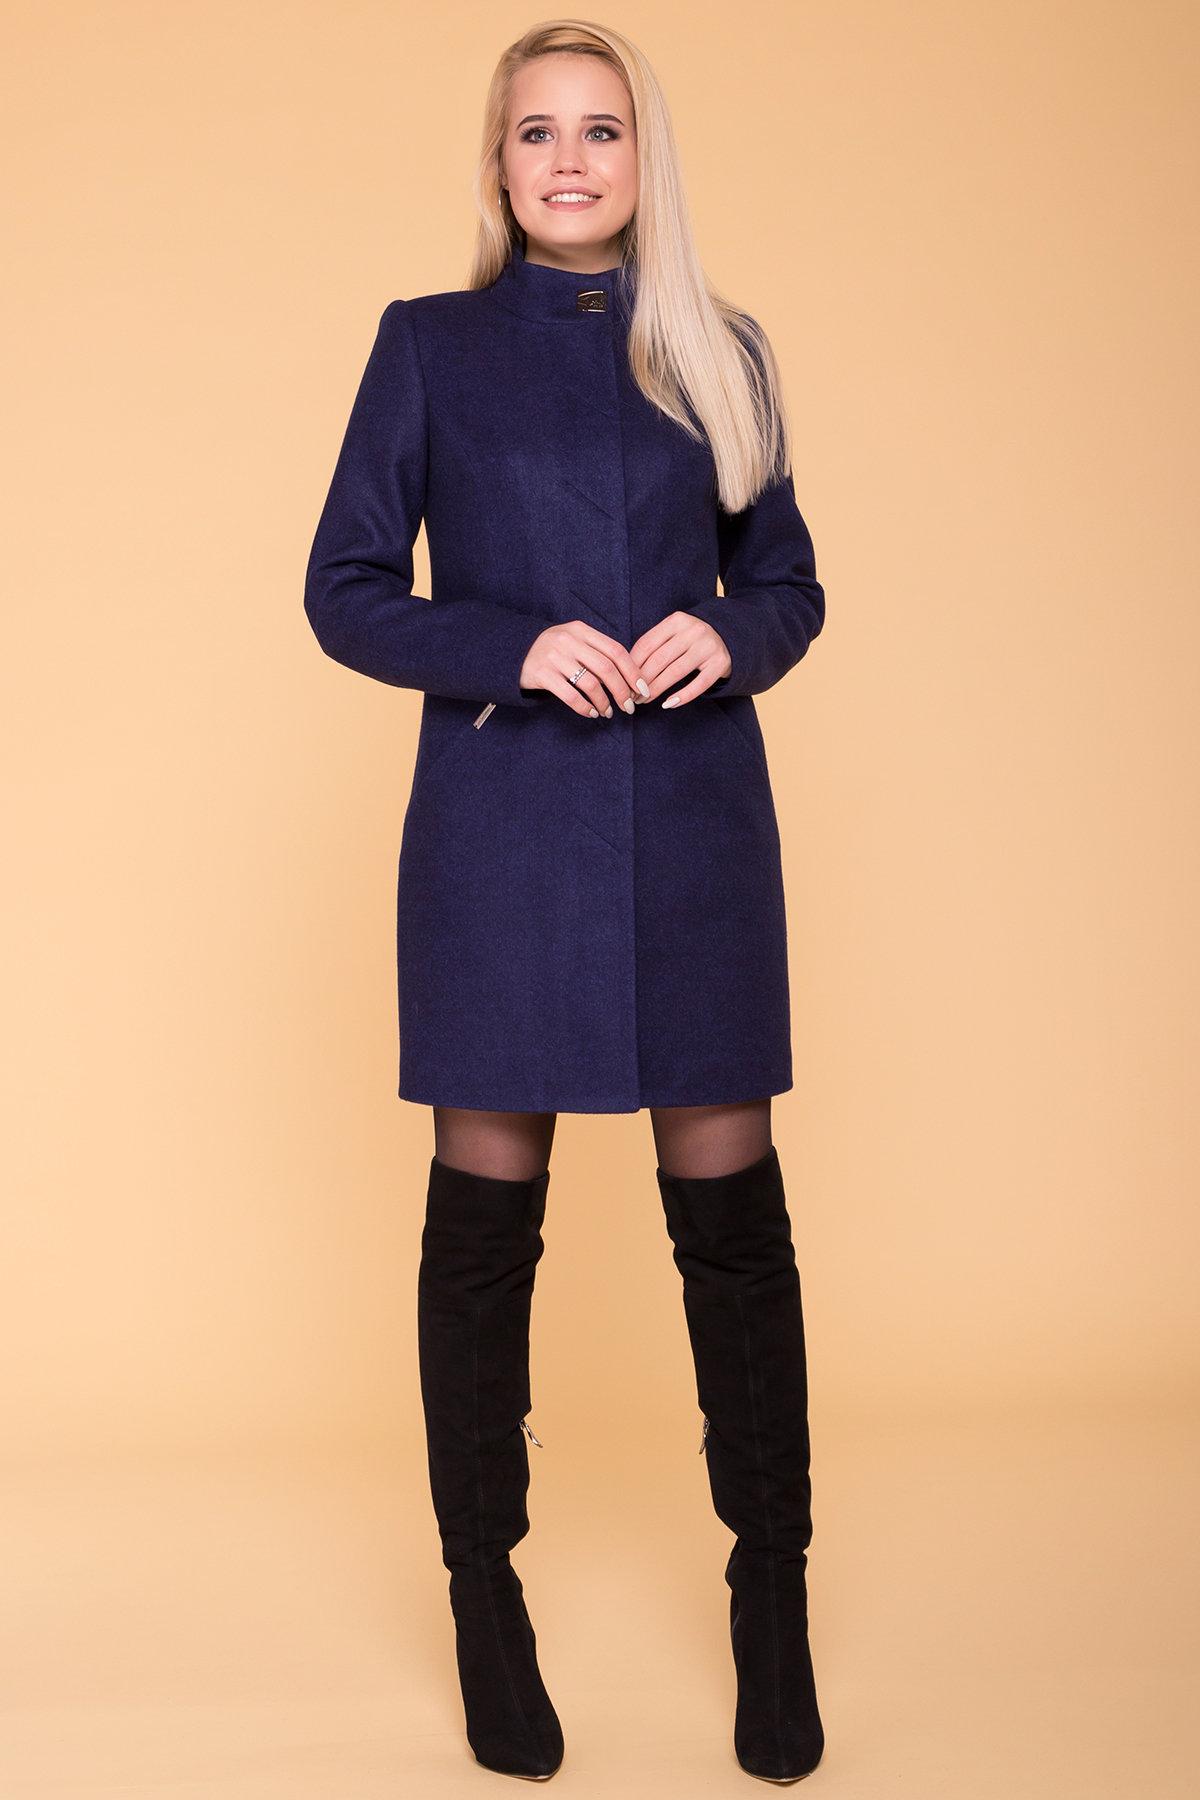 Пальто Сплит 4374 АРТ. 37660 Цвет: Темно-синий 17 - фото 4, интернет магазин tm-modus.ru